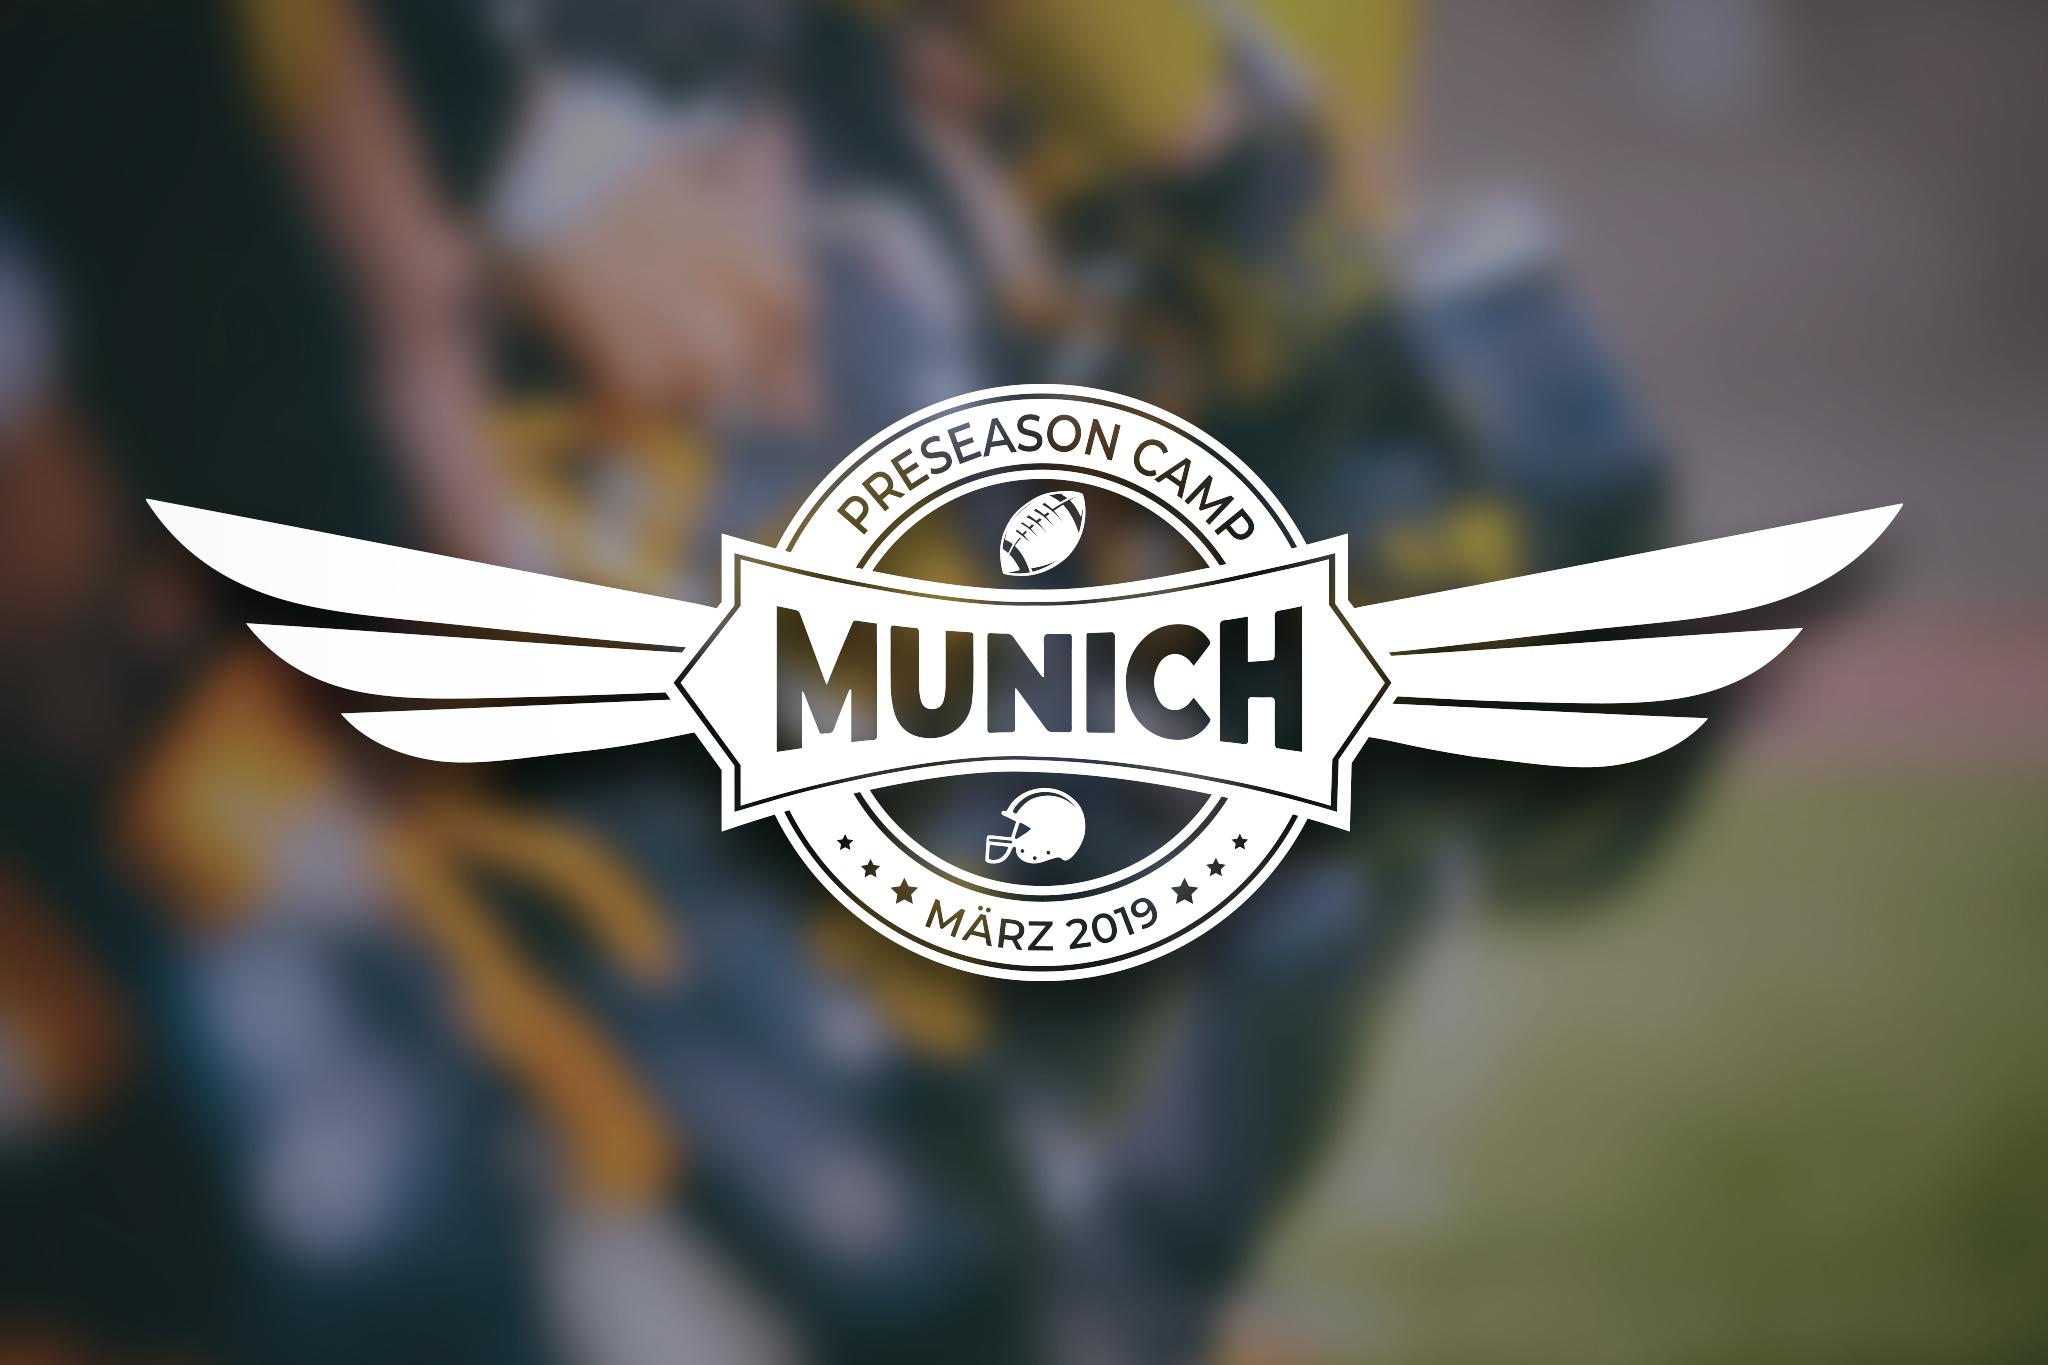 Munich Cowboys Preseason Camp